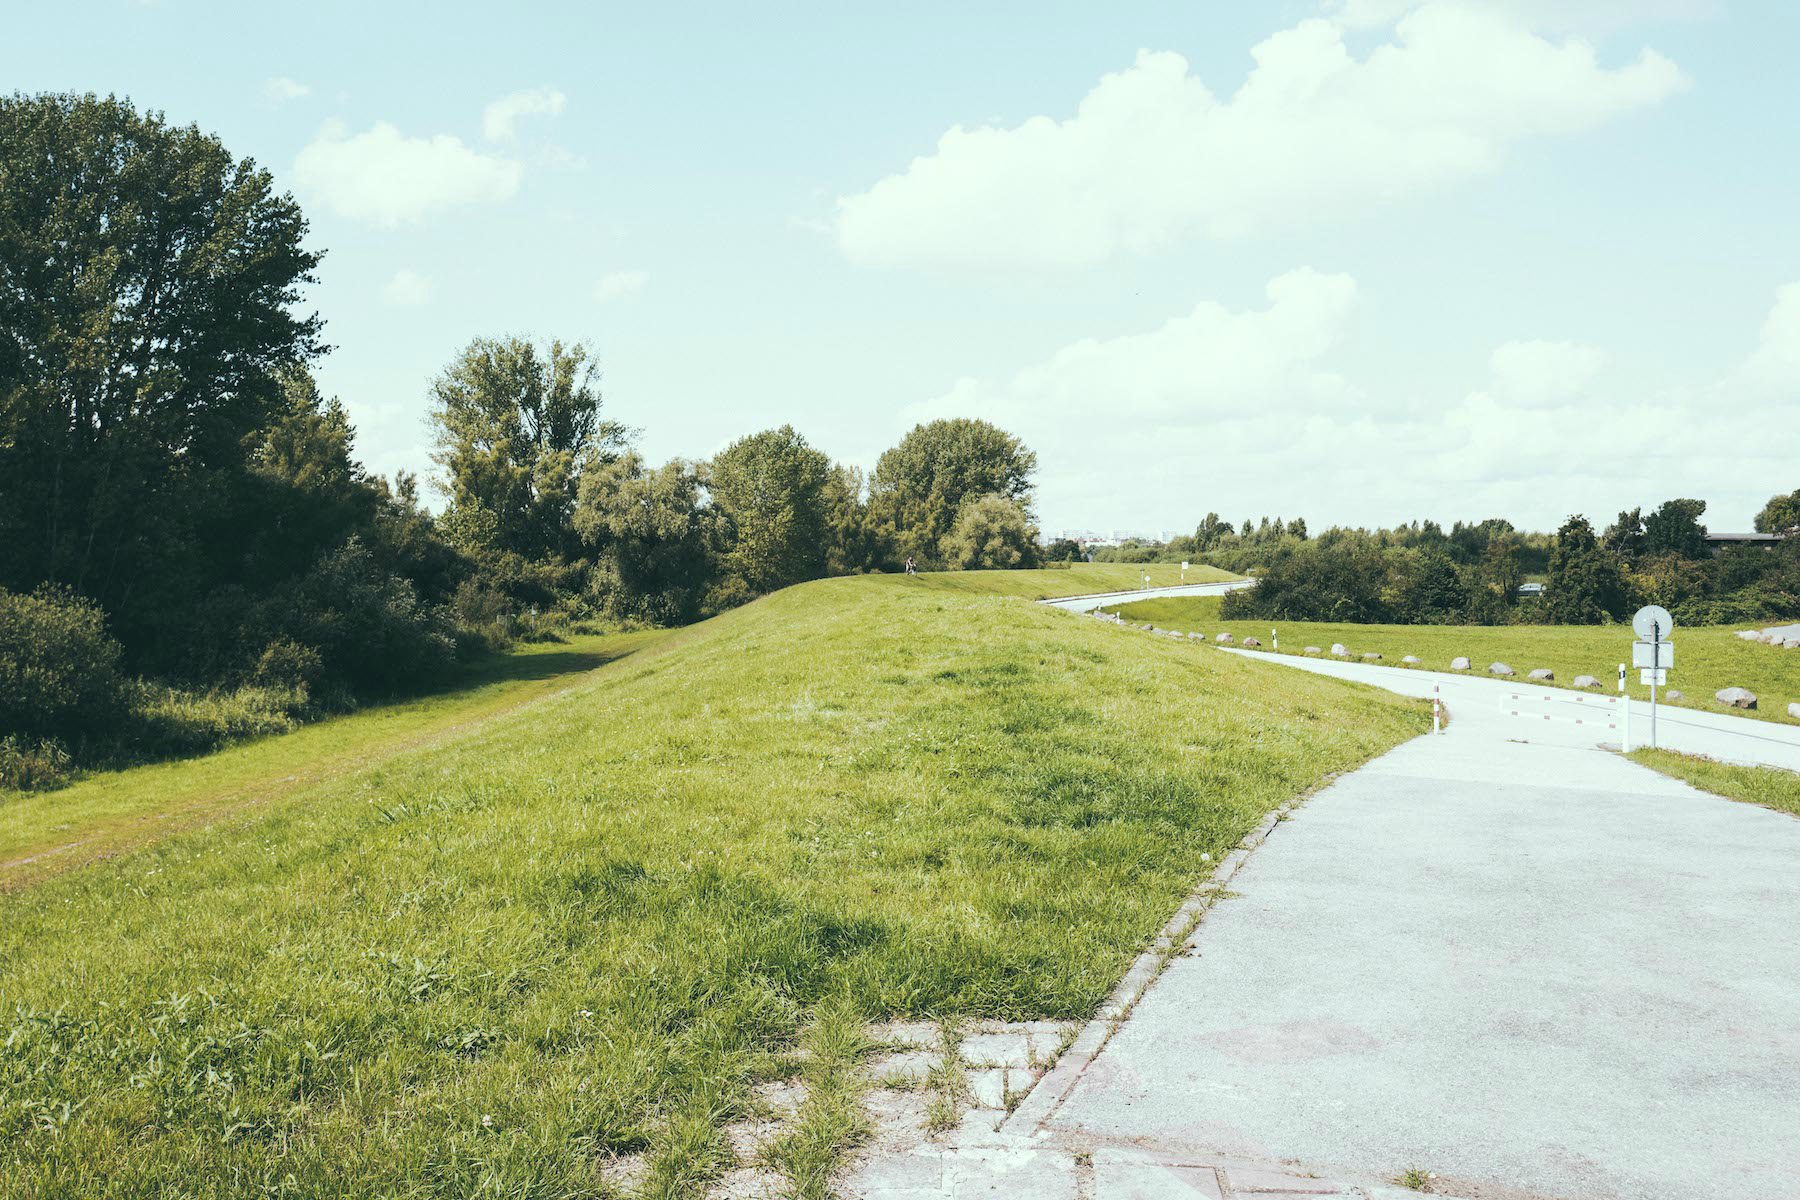 Geheimtipp Hamburg Natur & Ausflüge Wilhemsburg Naturschutzgebiet Heuckenlock Cristina Lopez 3